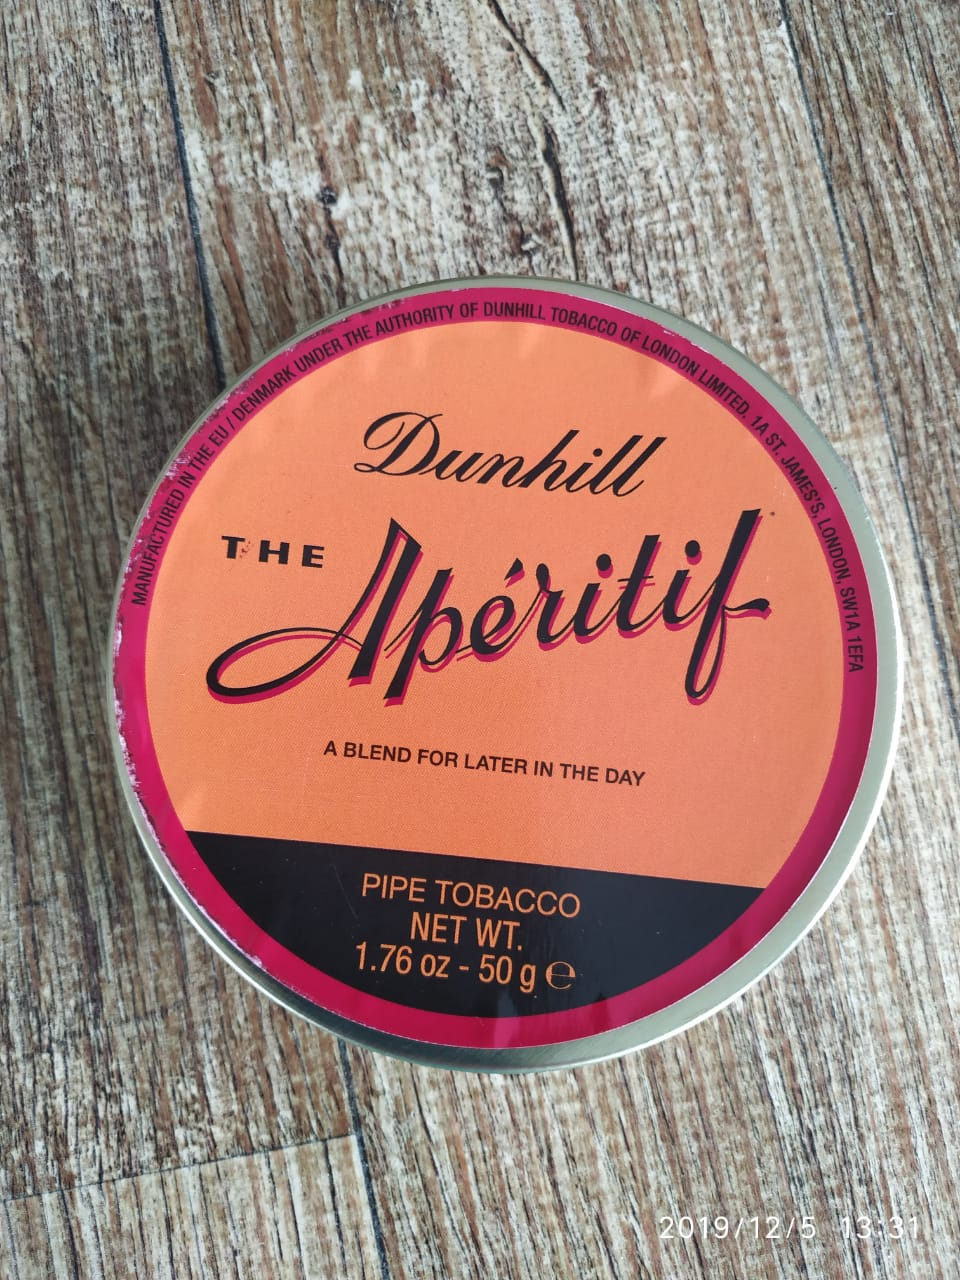 Dunhill - Aperitif